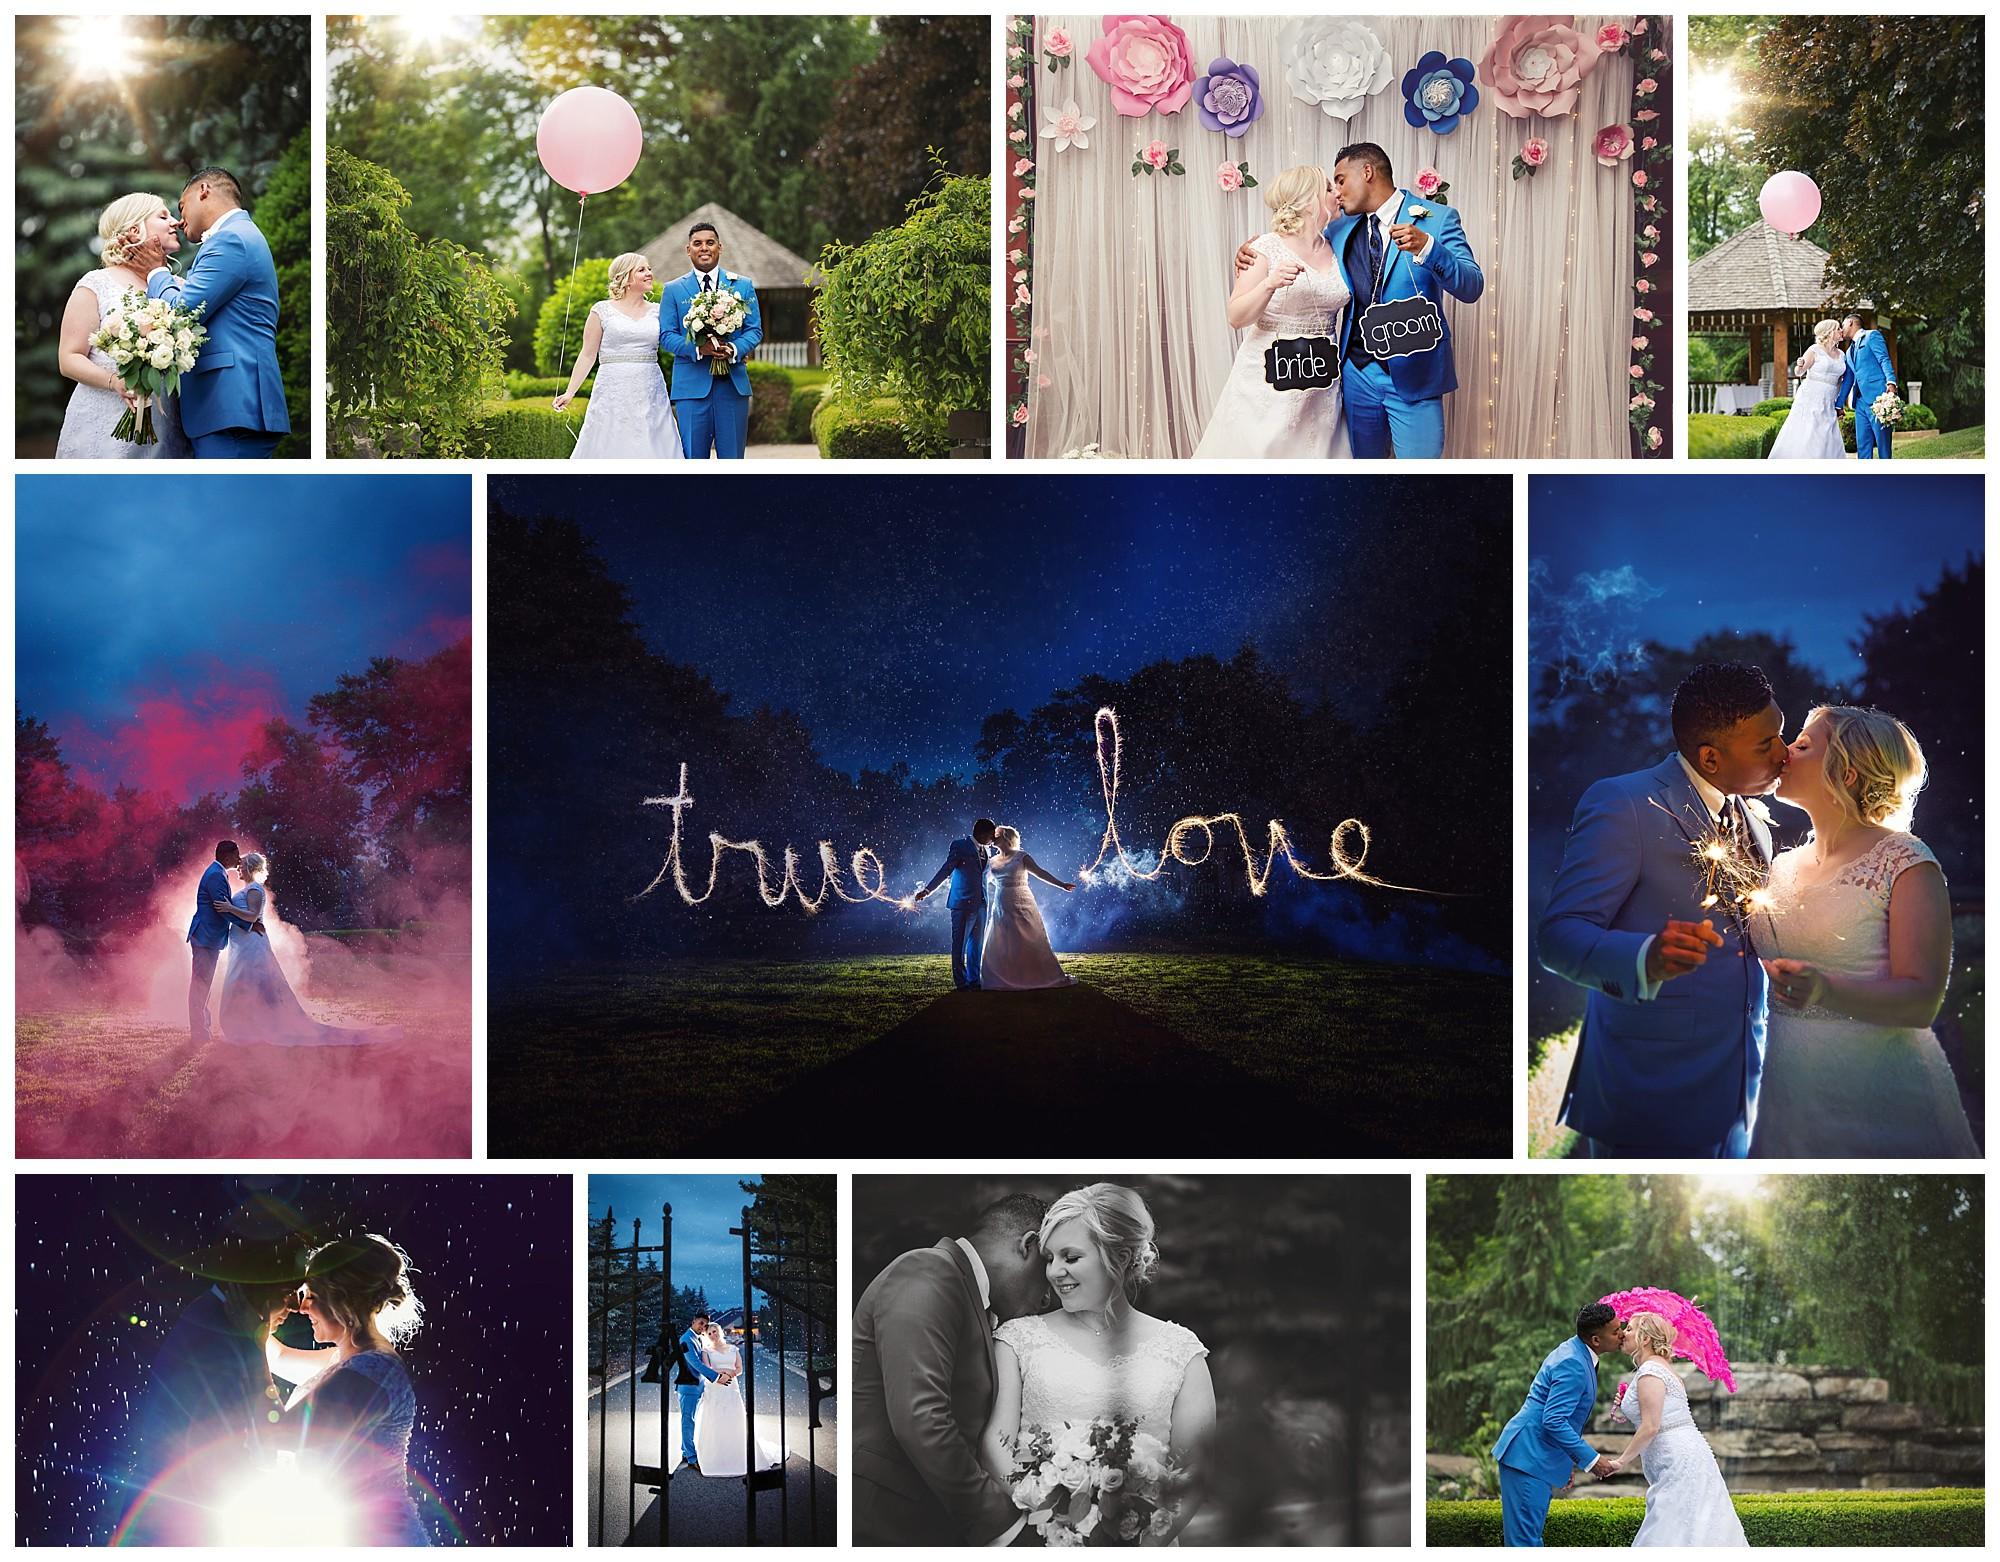 Terrace on the Green, Brampton, Ontario wedding photos by VanDaele & Russell